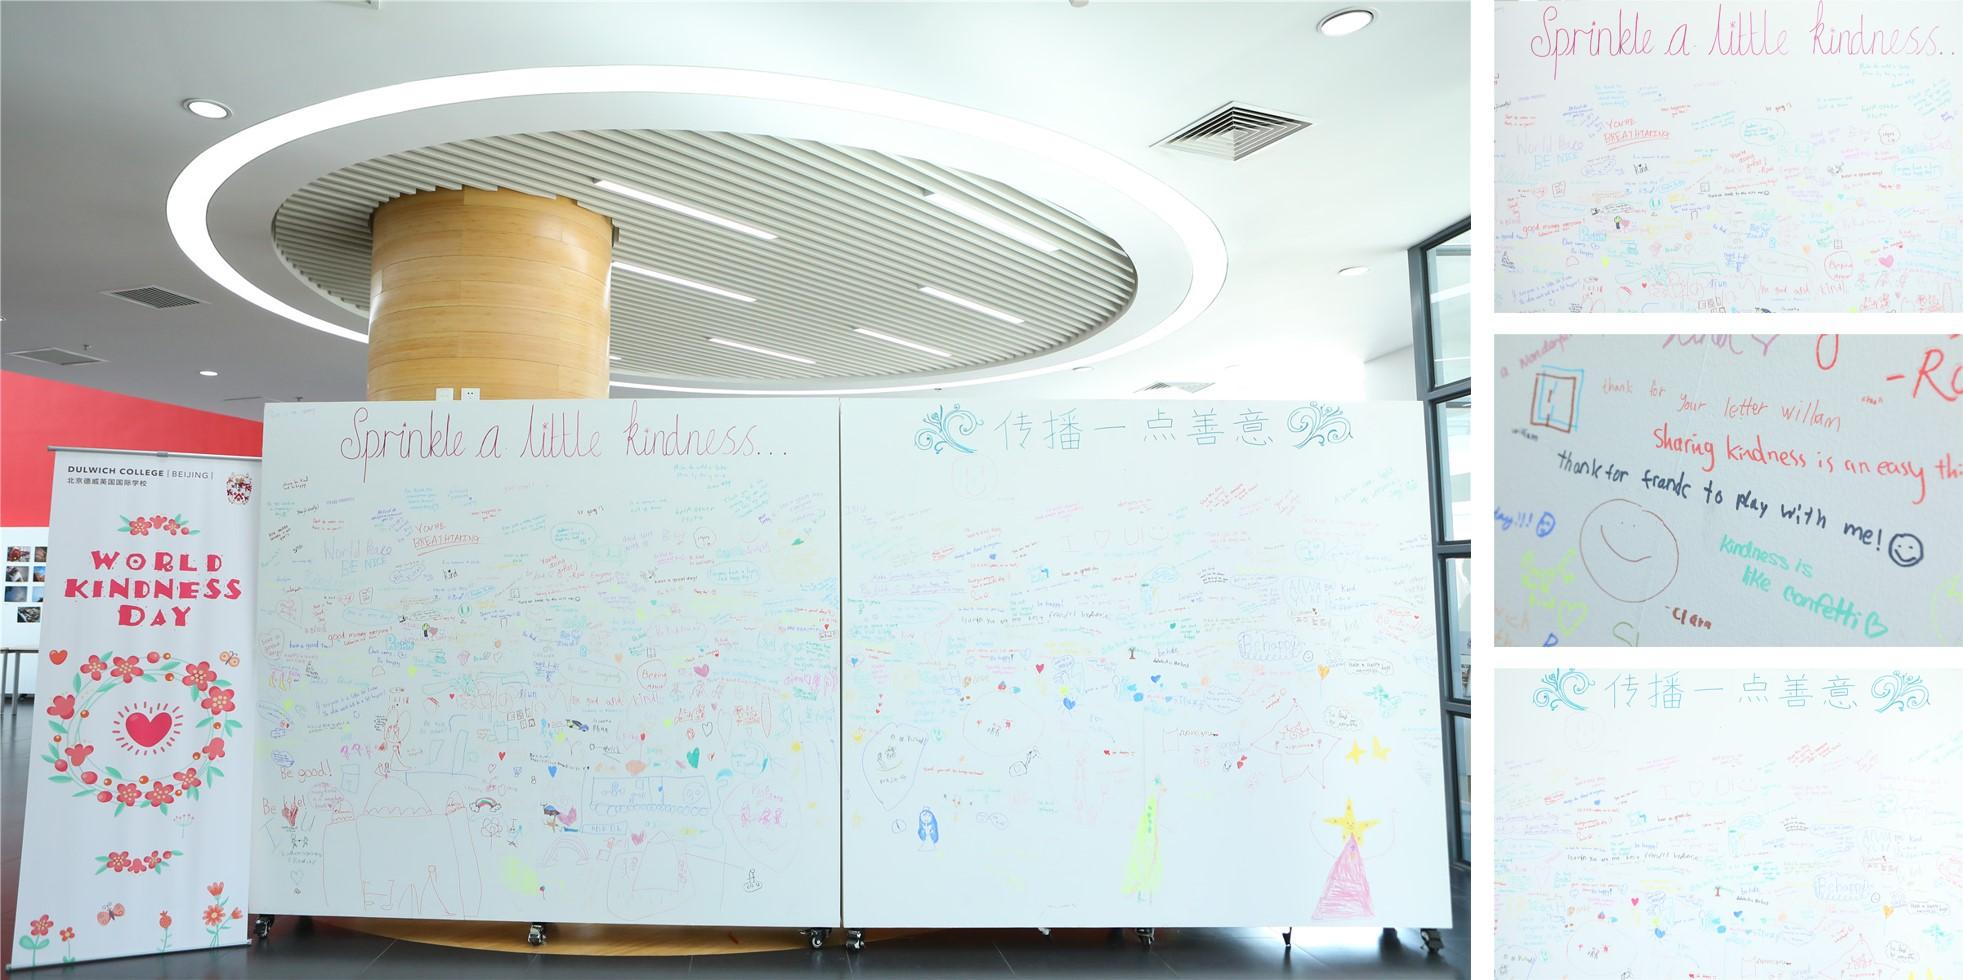 kindness-wall-北京德威英国国际学校